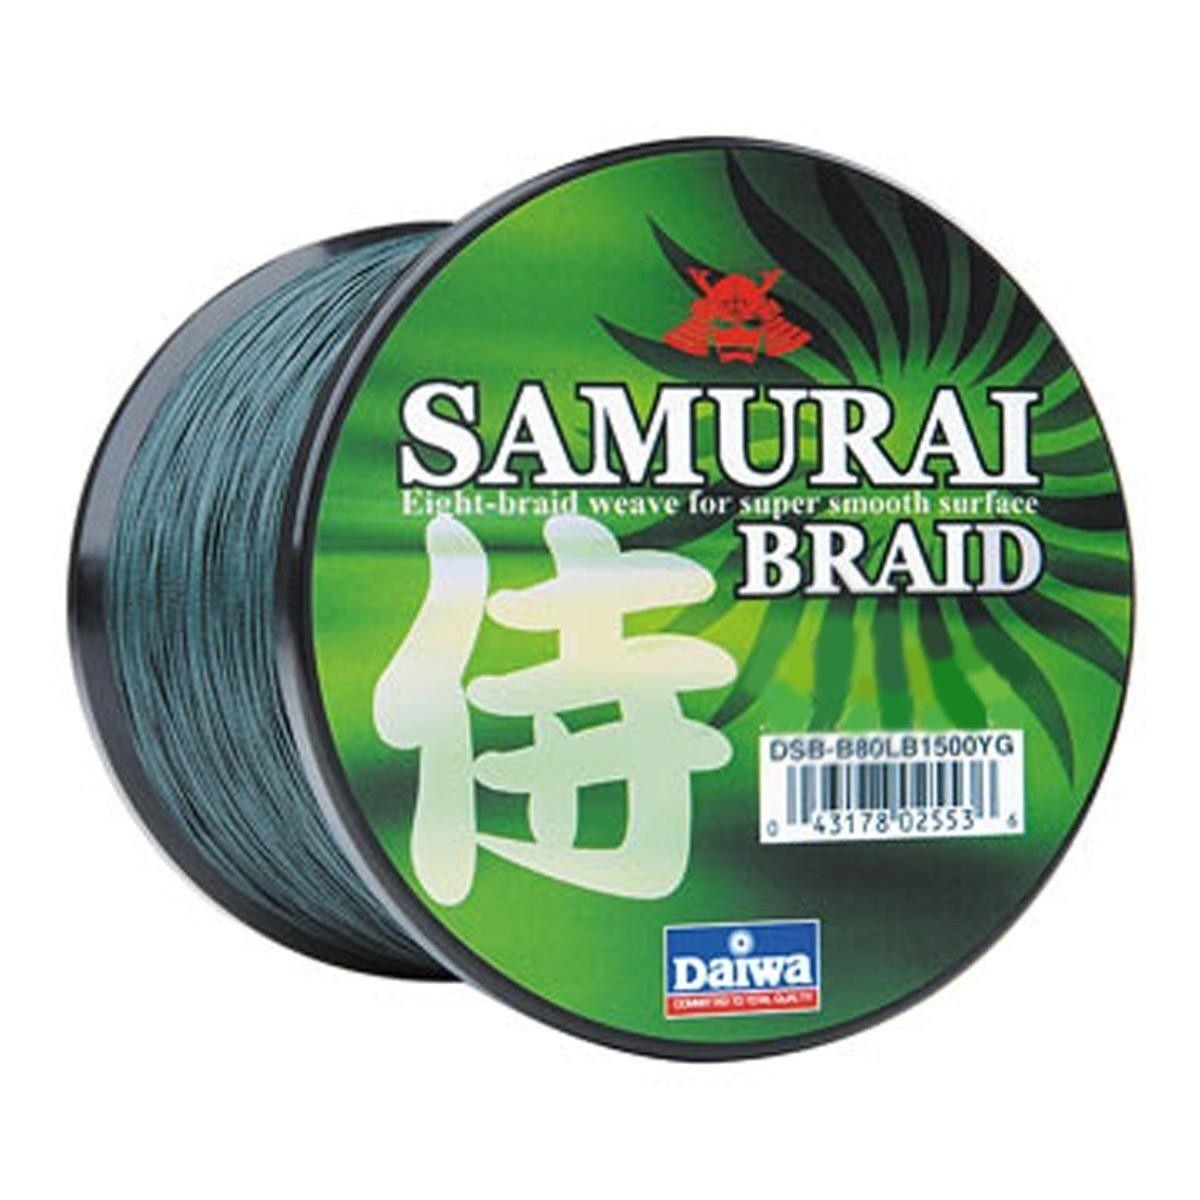 Daiwa Samurai Braided Line  verde 20lb Test, 1500 yards  DSBB20LBG